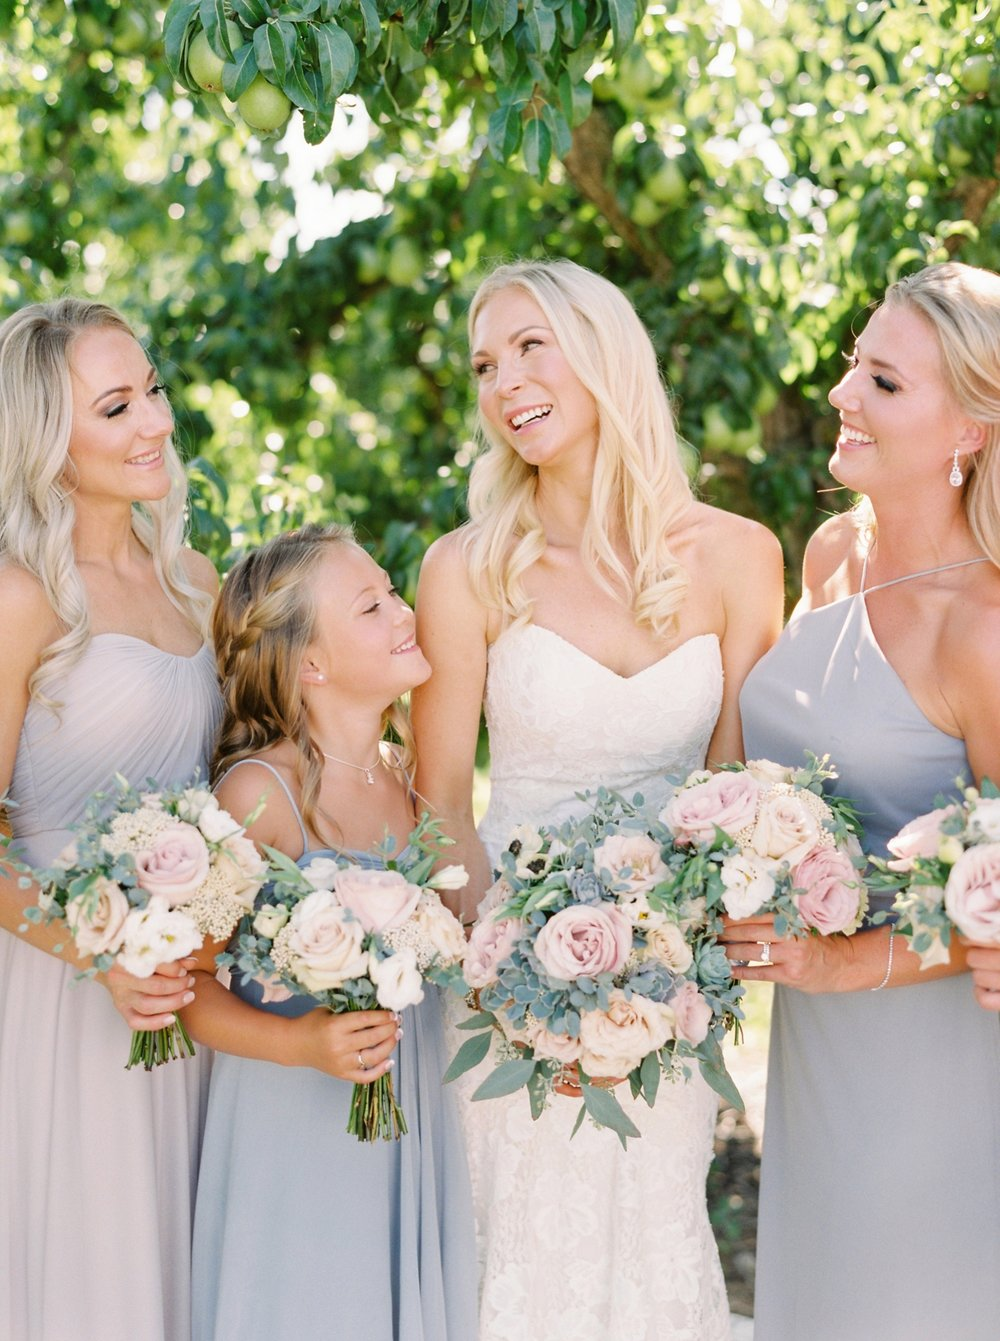 Kelowna wedding photographers | hotel eldorado wedding | okanagan wedding | Justine Milton fine art film Photography | pastel bridal bouquet | blush and blues